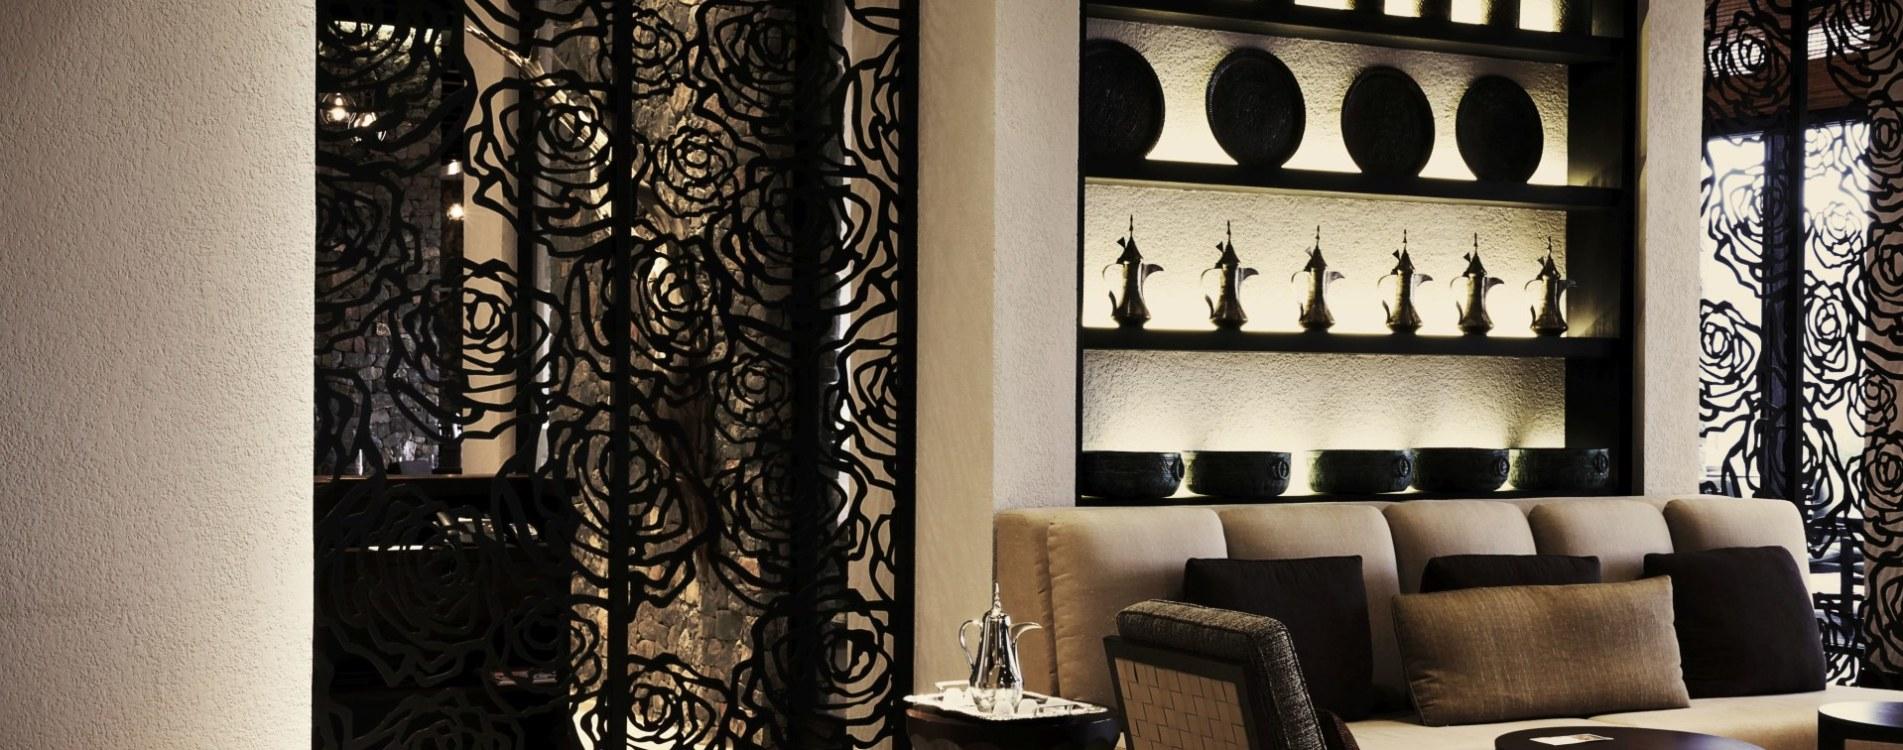 Alila-Jabal-Akhdar-Interior-Lobby-Details-Oman.jpg